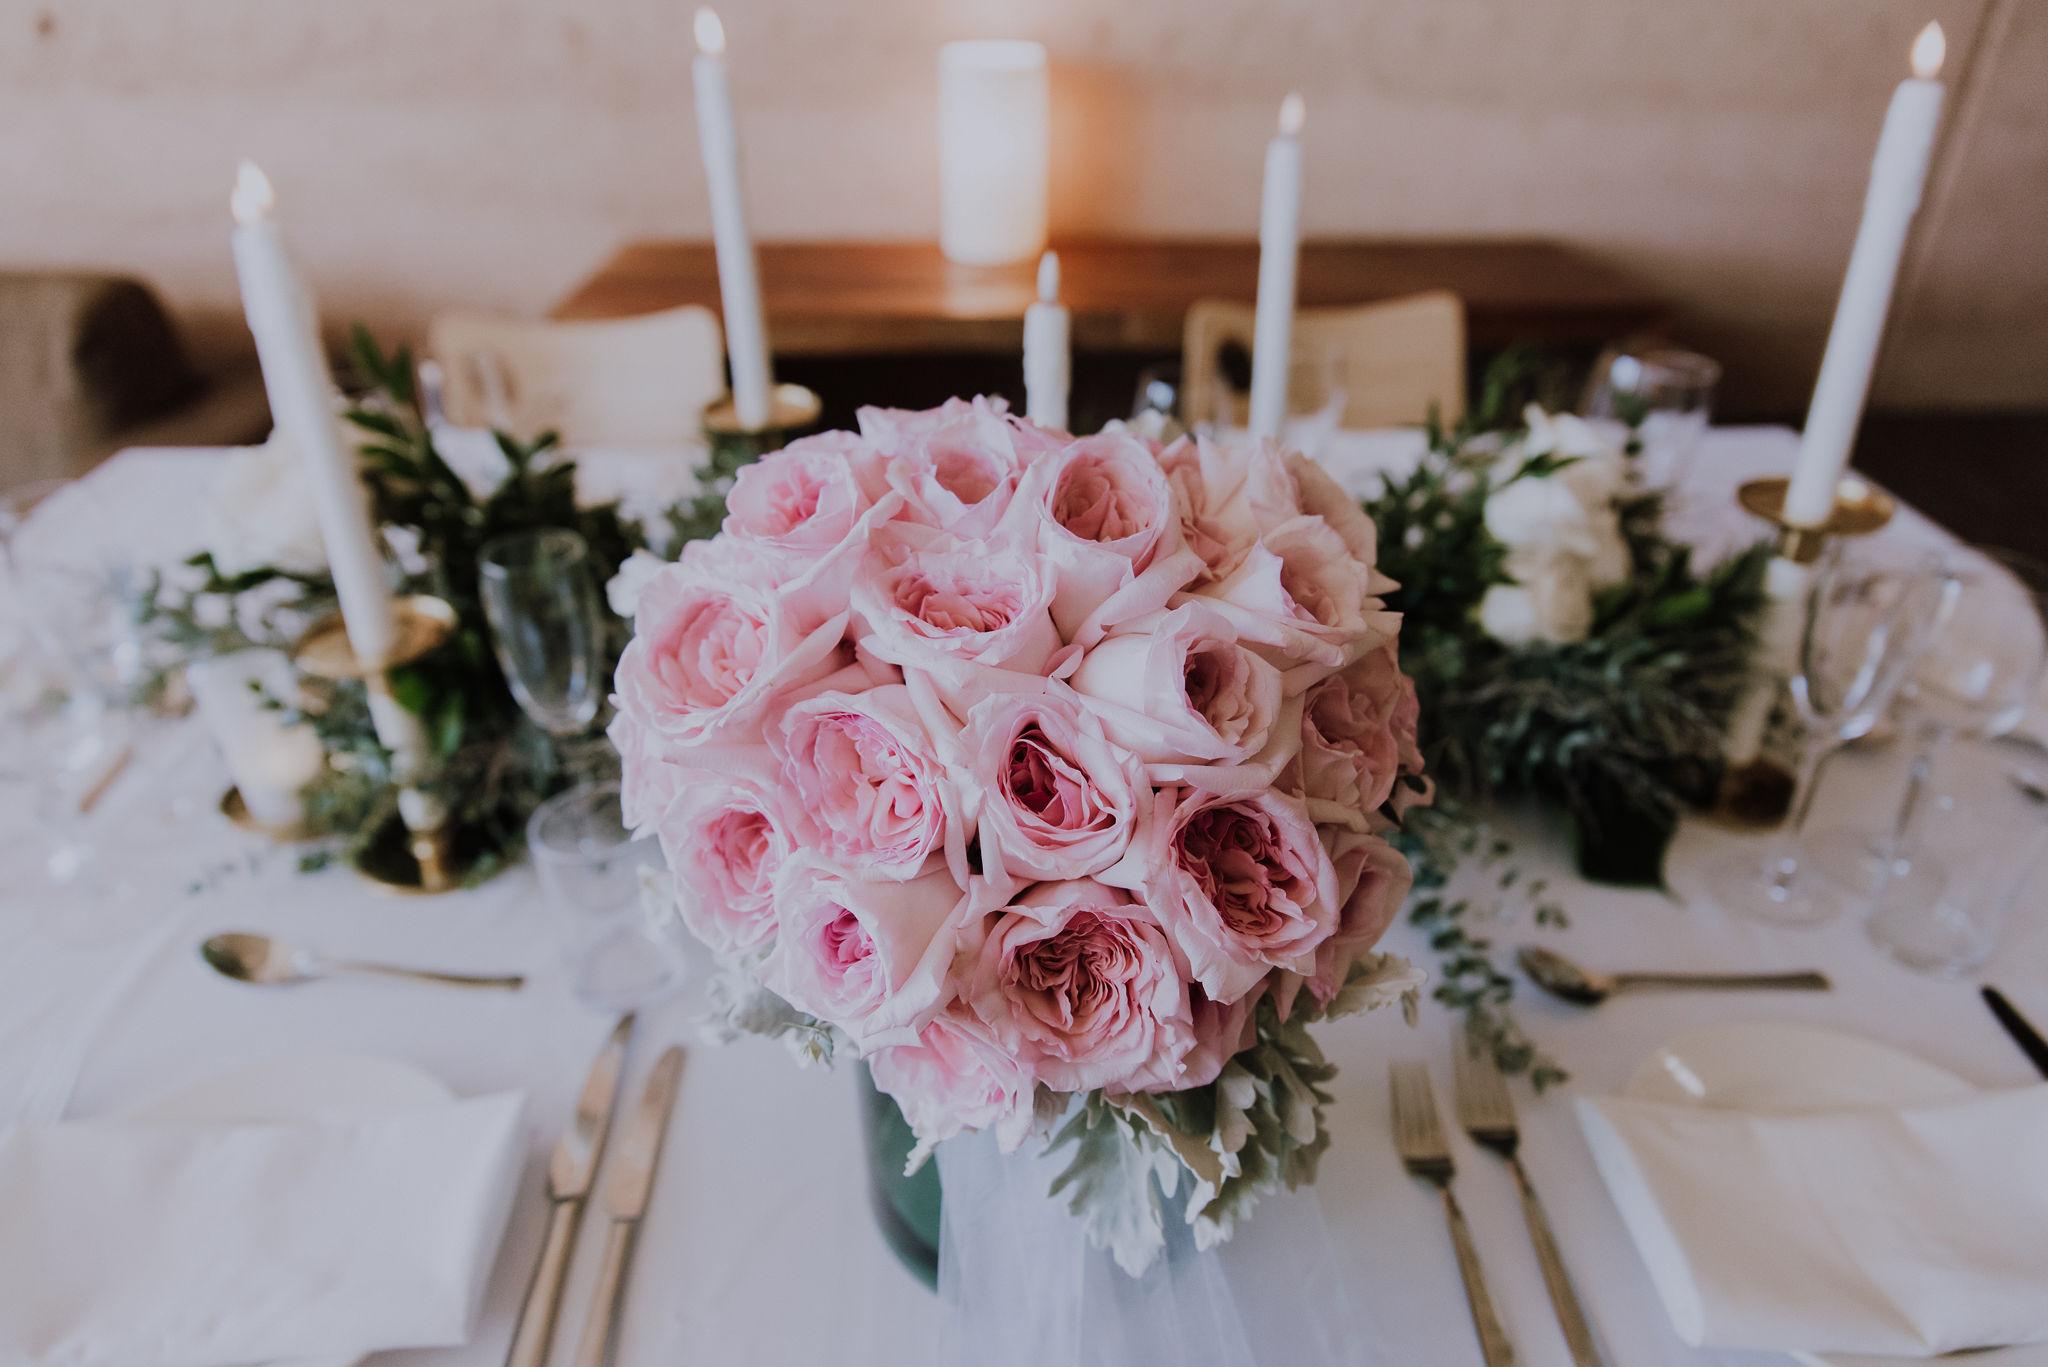 saltandsandeventhire-wedding-stylist-exmouth-ningaloo-wa-R&O-Elopement-Renaeharveyphotograpy-6.jpg